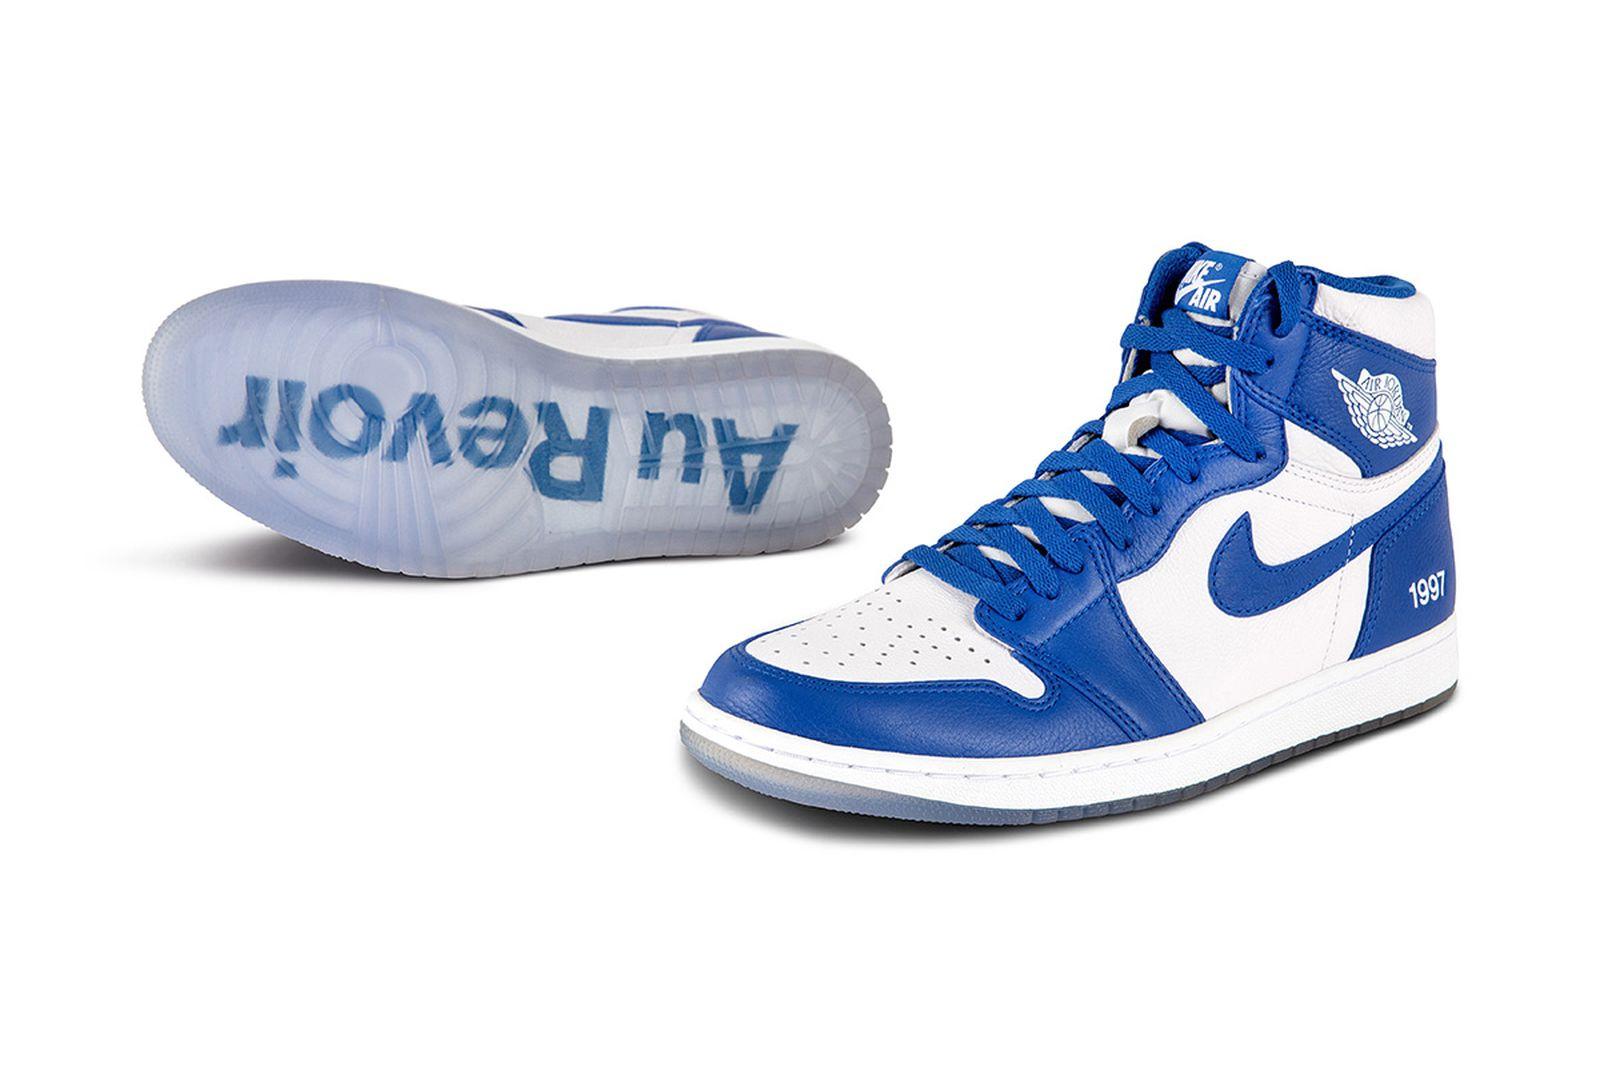 sothebys-rare-nike-sneaker-auction-07